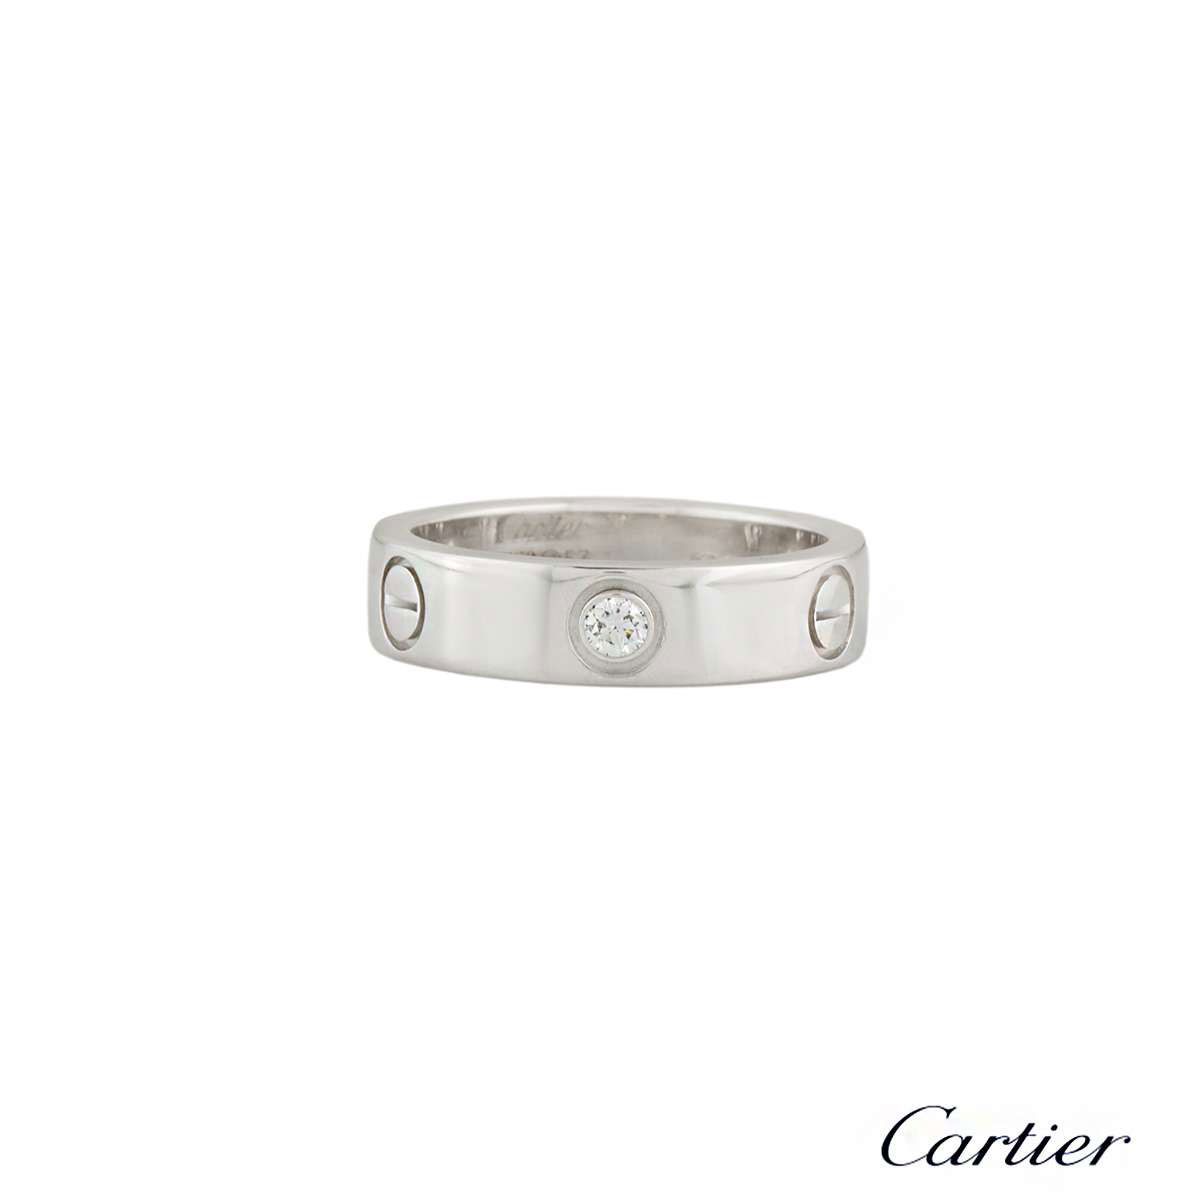 CartierWhite Gold Half Diamond Love Ring Size 55 B4032555